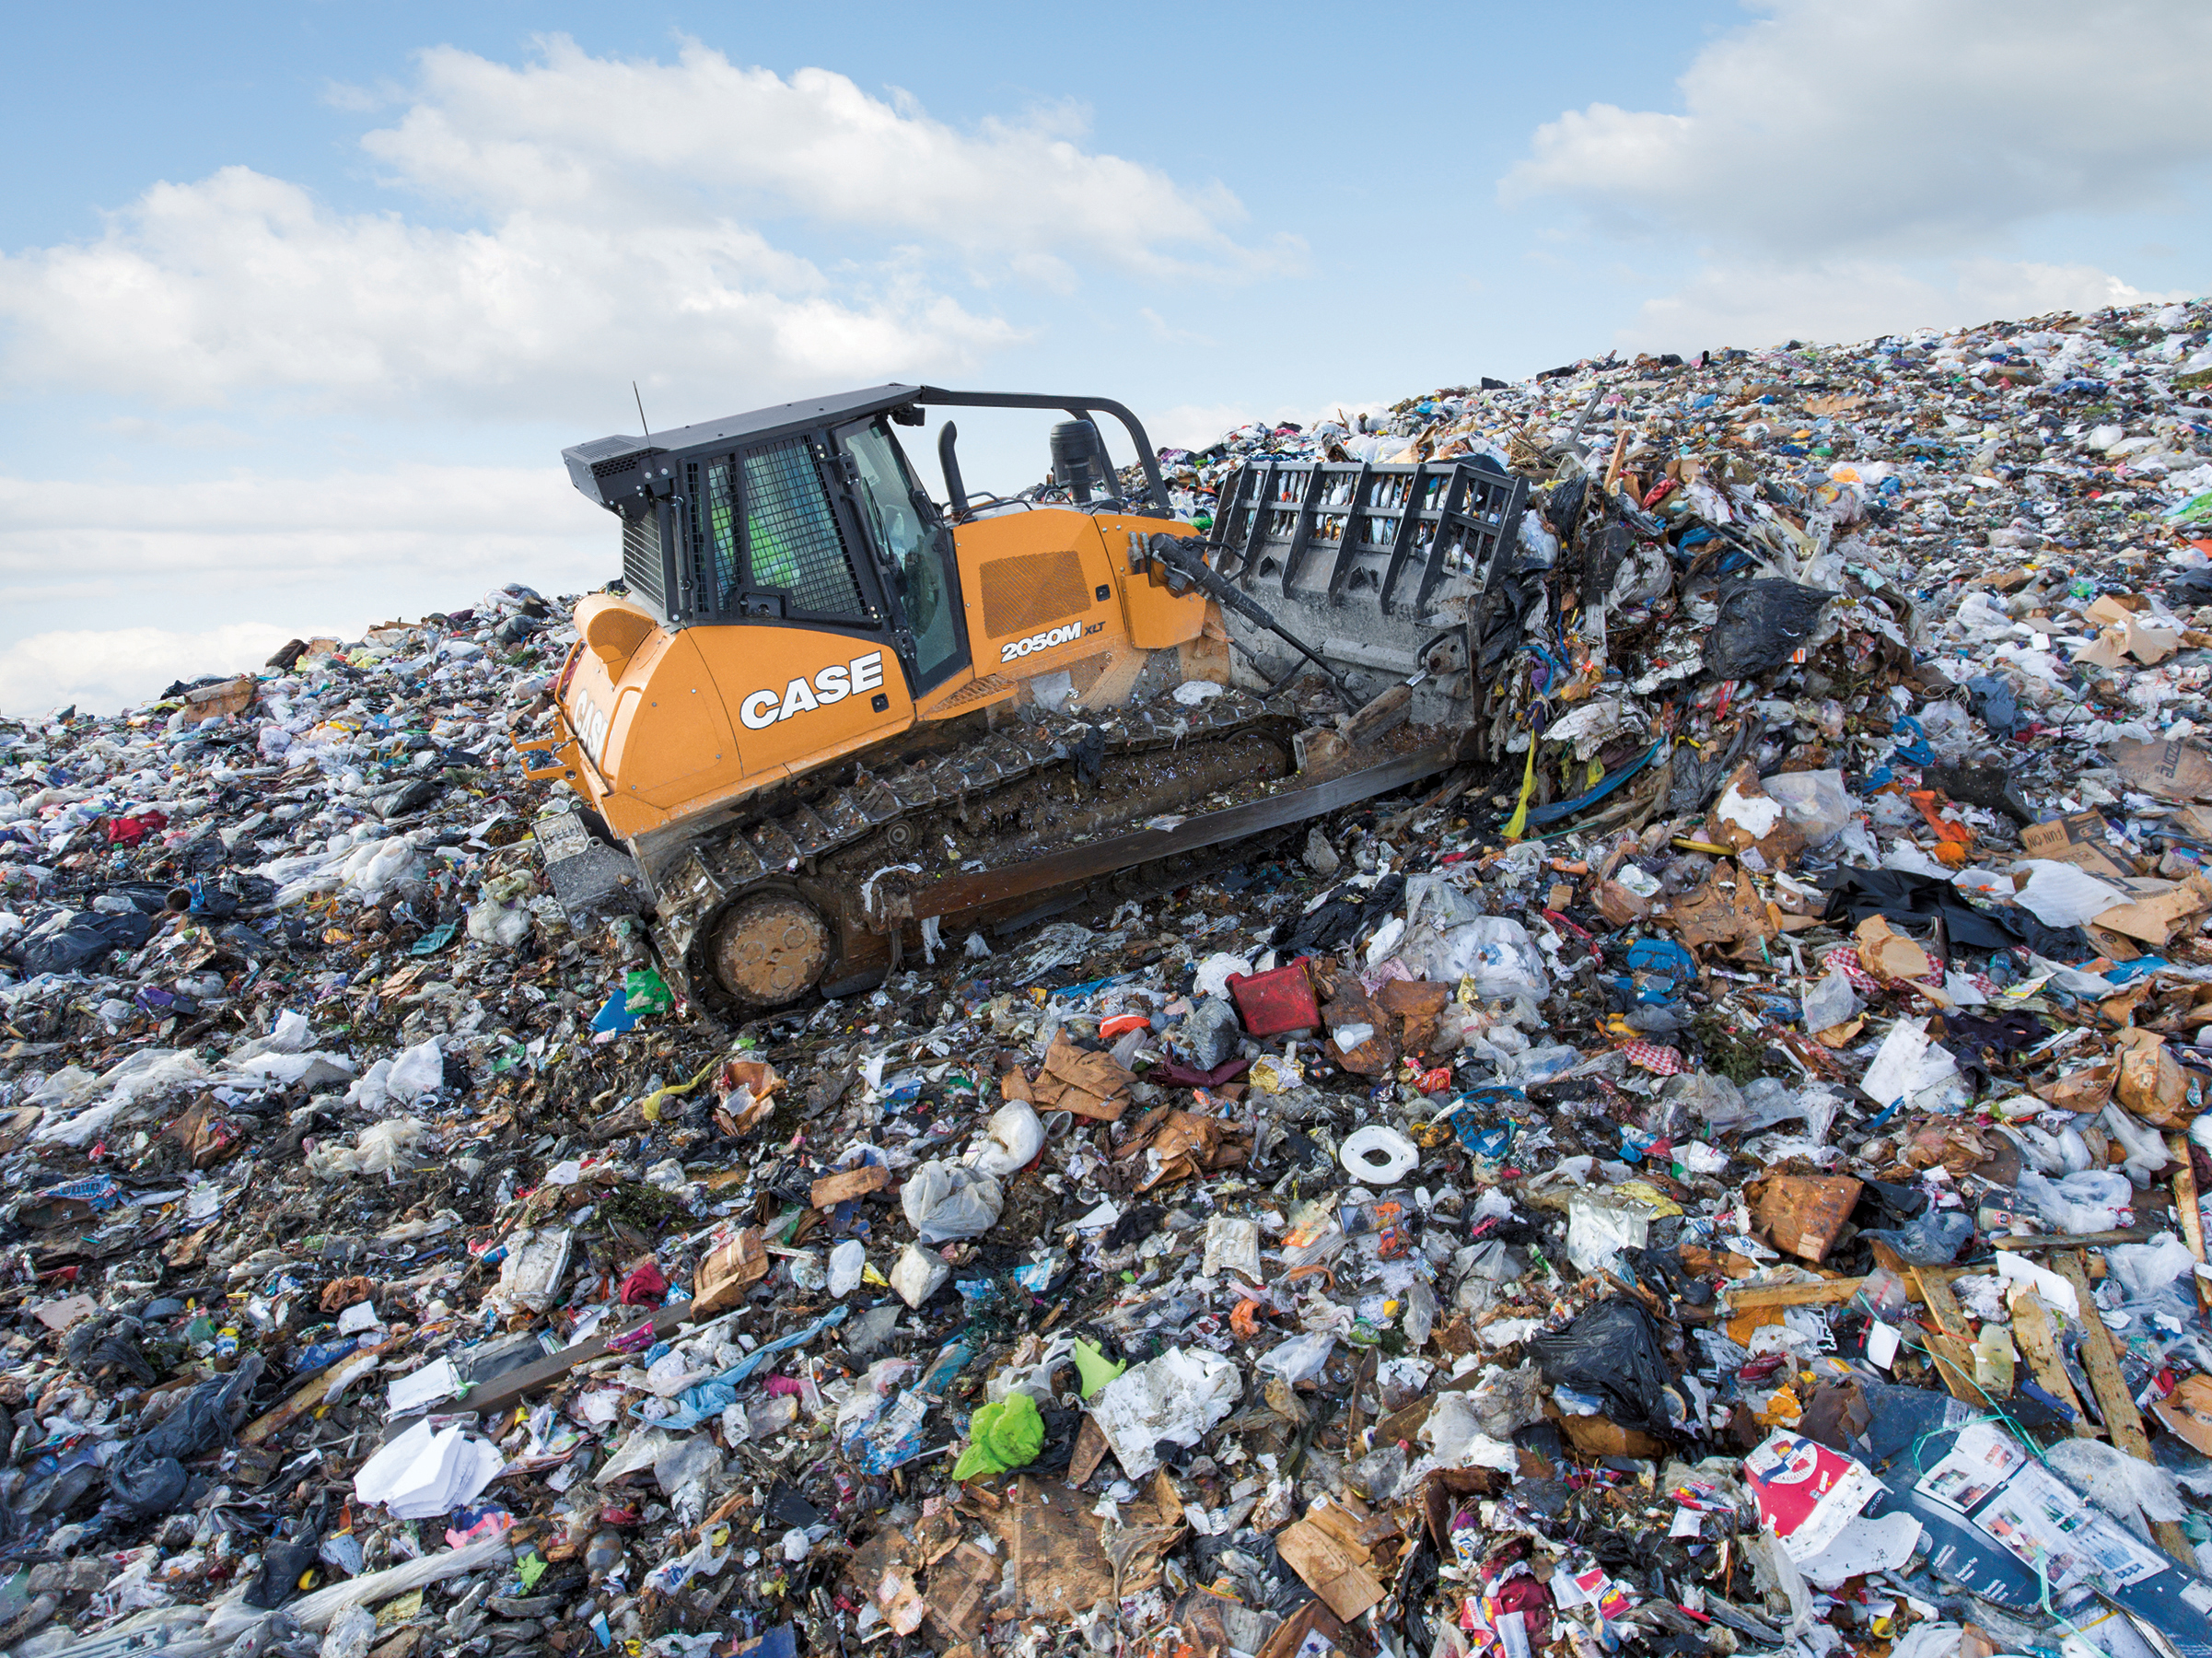 Case Launches Landfill Configuration for 2050M Dozer